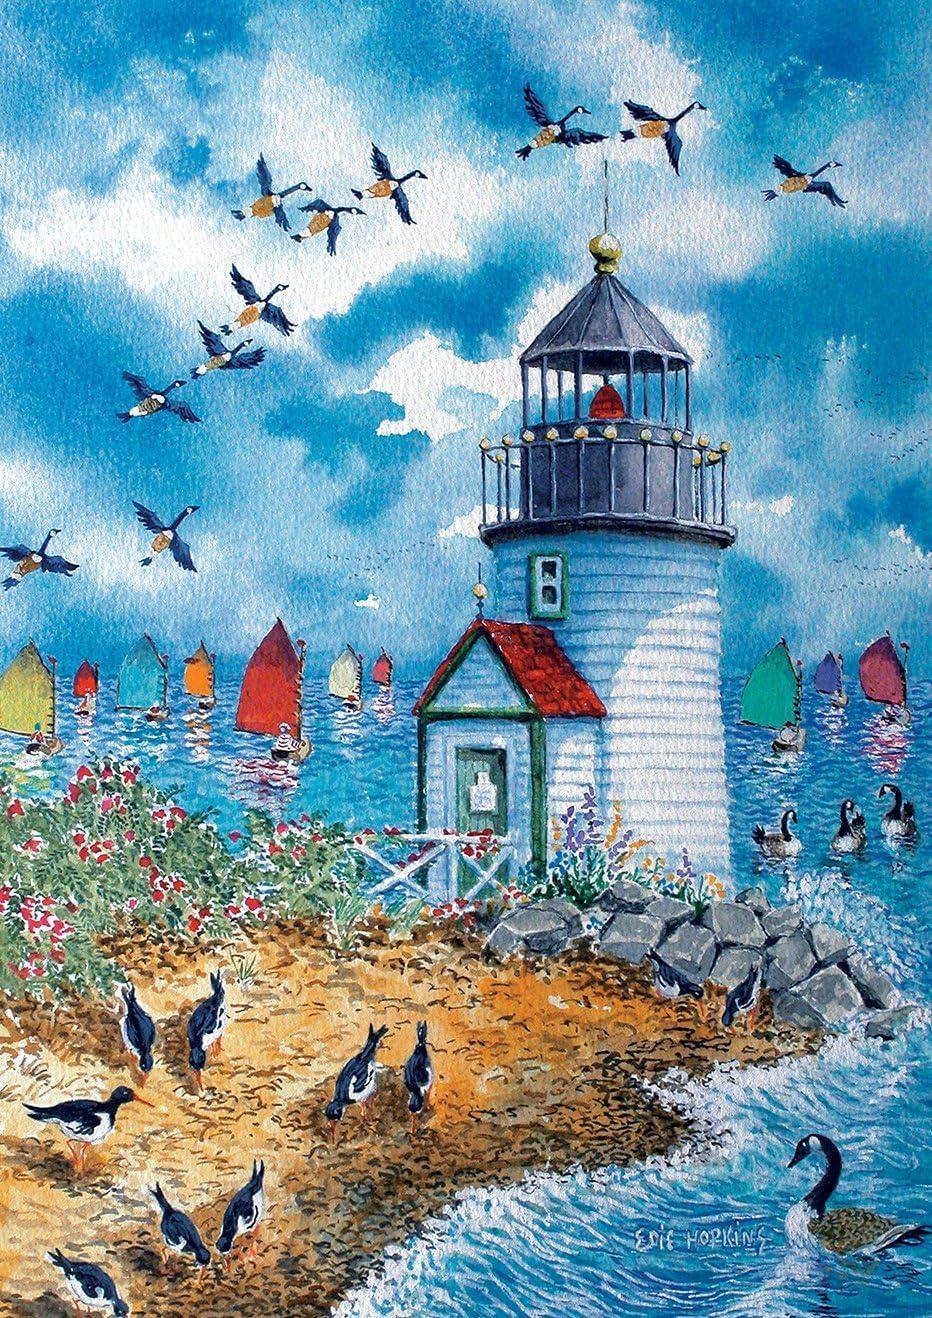 Toland Home Garden Lighthouse Point 12.5 x 18 Inch Decorative Summer Coastal Beach Birds Sailboats Garden Flag